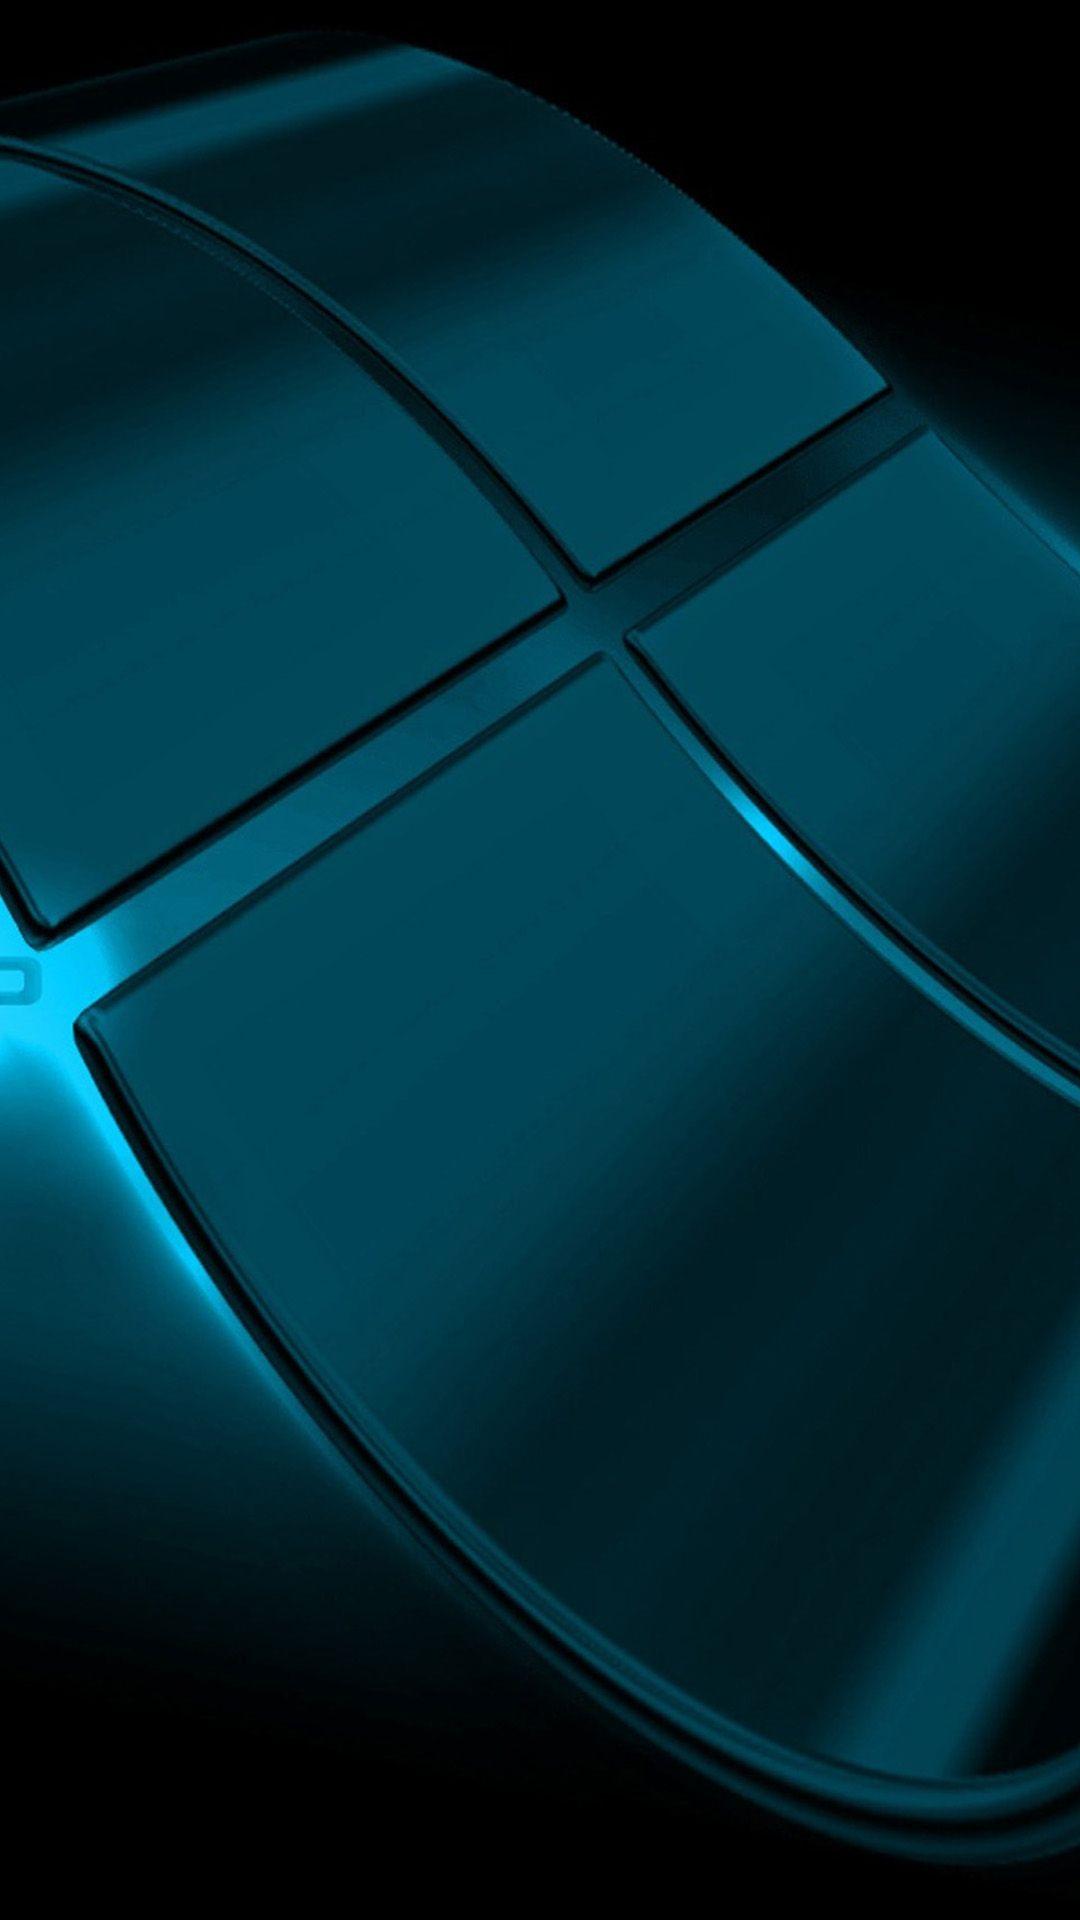 Original Windows Xp Photo Blue Galaxy Wallpaper Blue Wallpapers Wallpaper